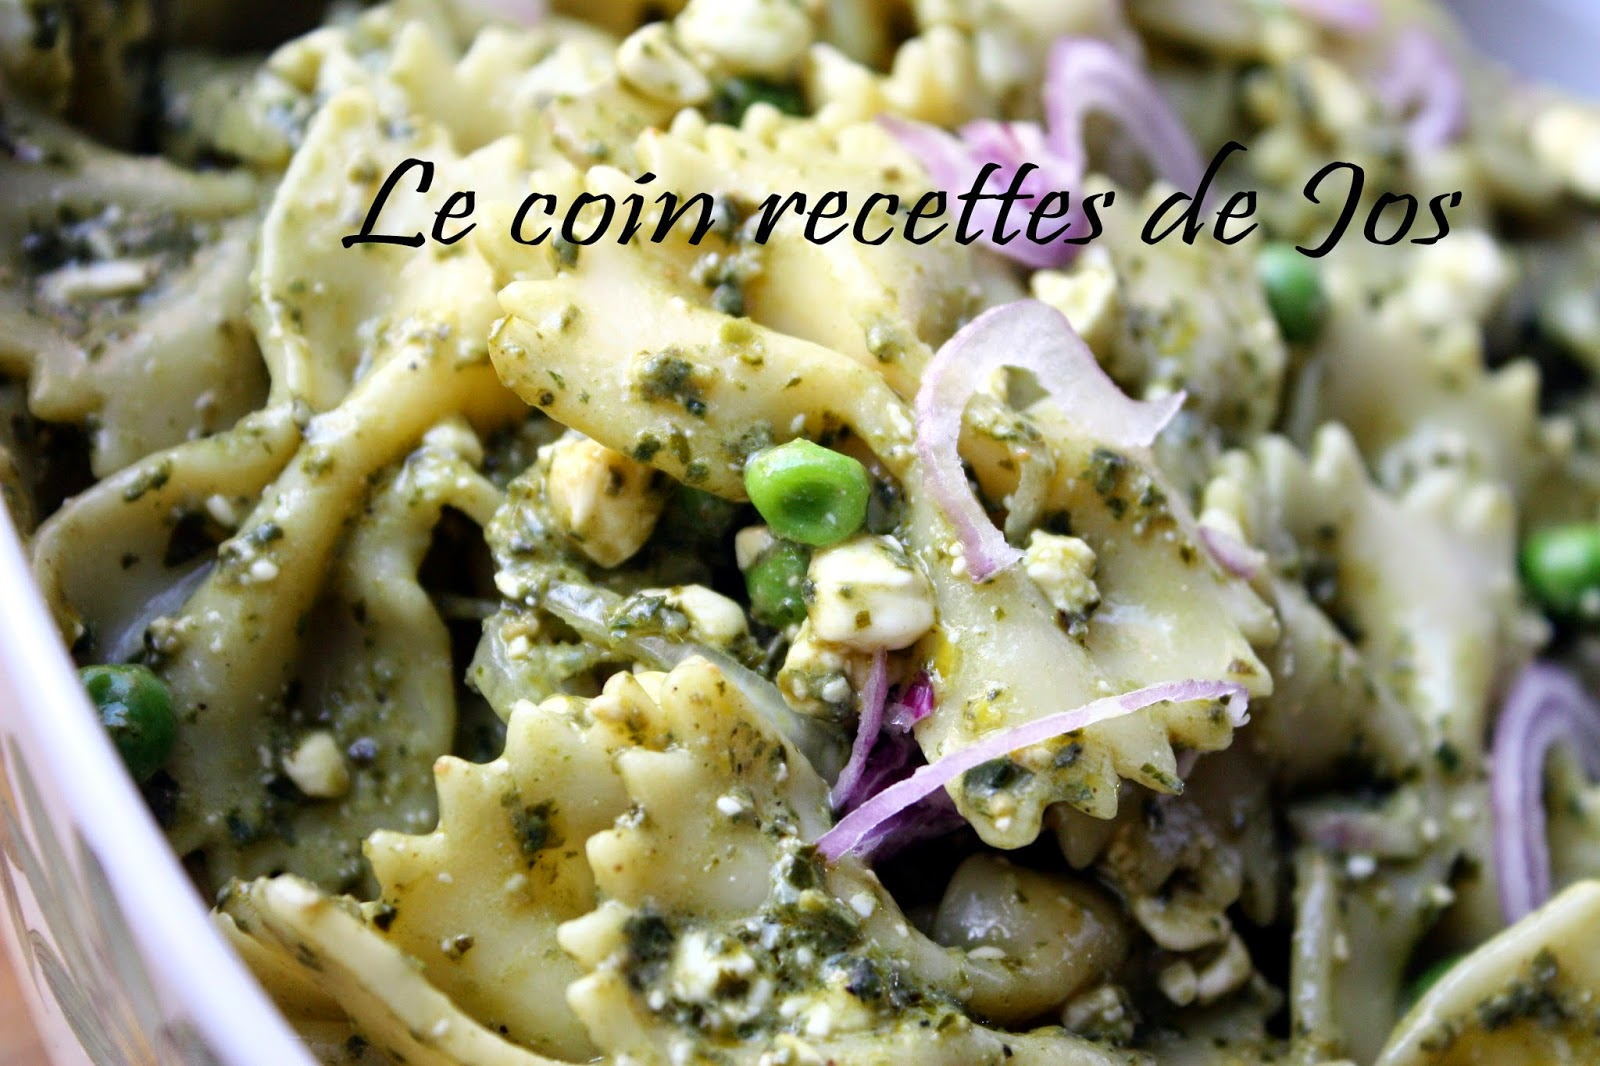 Le coin recettes de Jos: SALADE DE PÂTES AU PESTO ET RICOTTA - Salade Pates Pesto